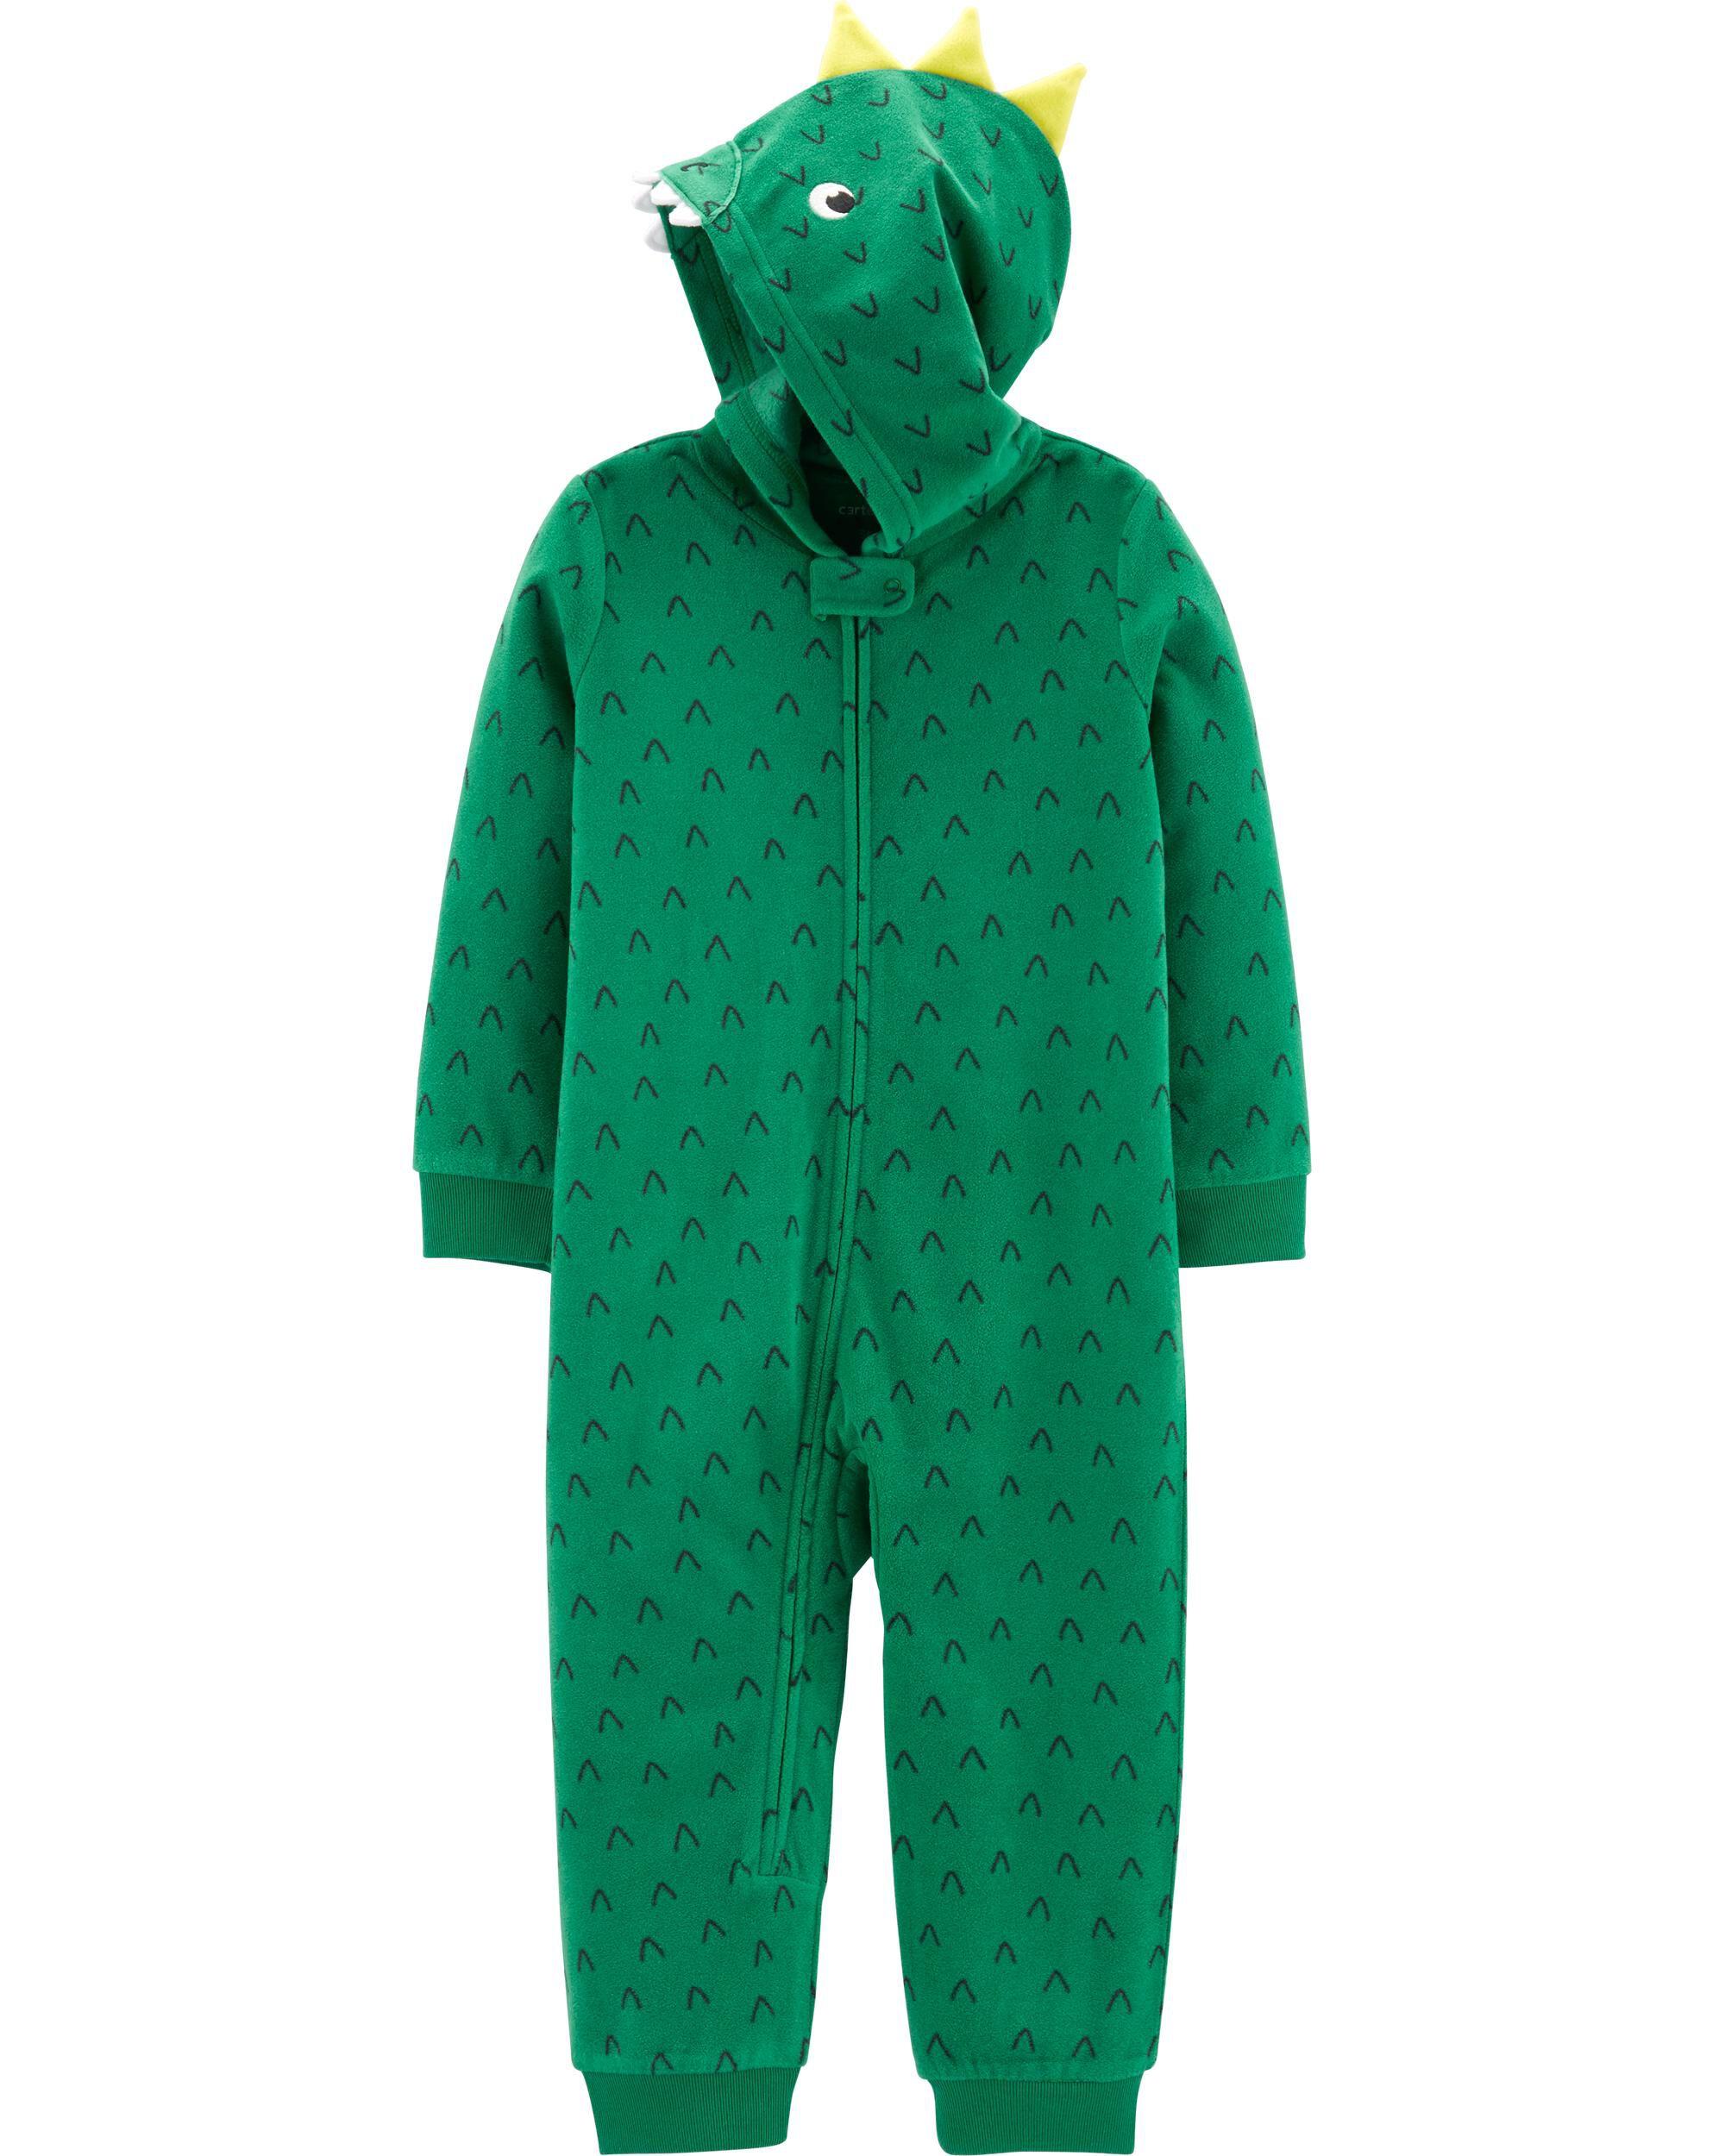 *CLEARANCE* 1-Piece Dinosaur Hooded Fleece Footless PJs